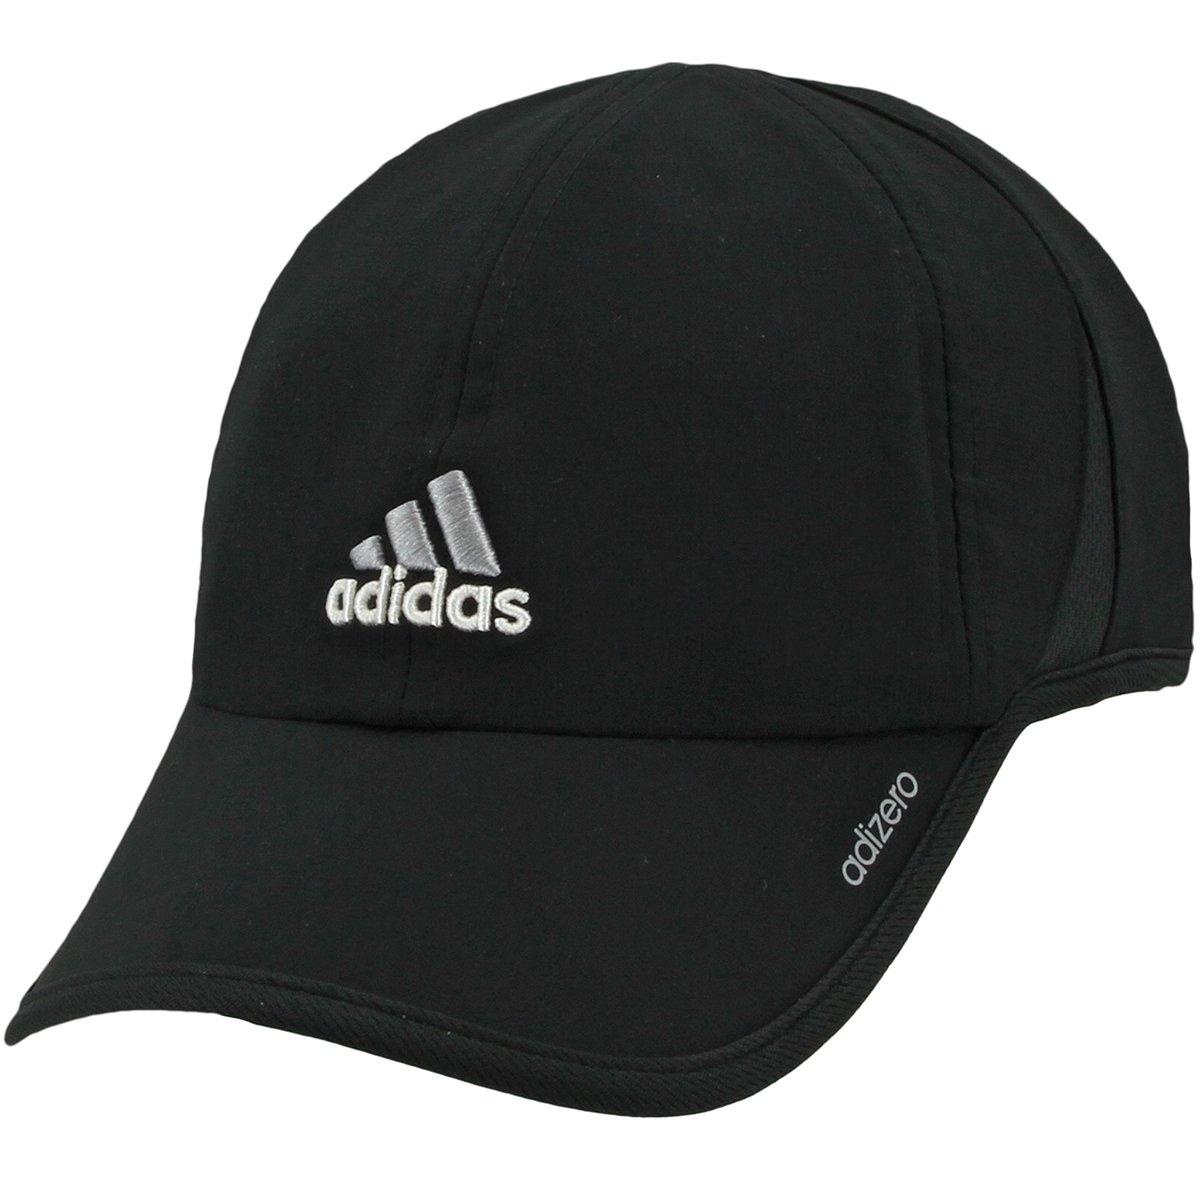 Adidas Adizero Sombrero Gris 2obA9hVoGe